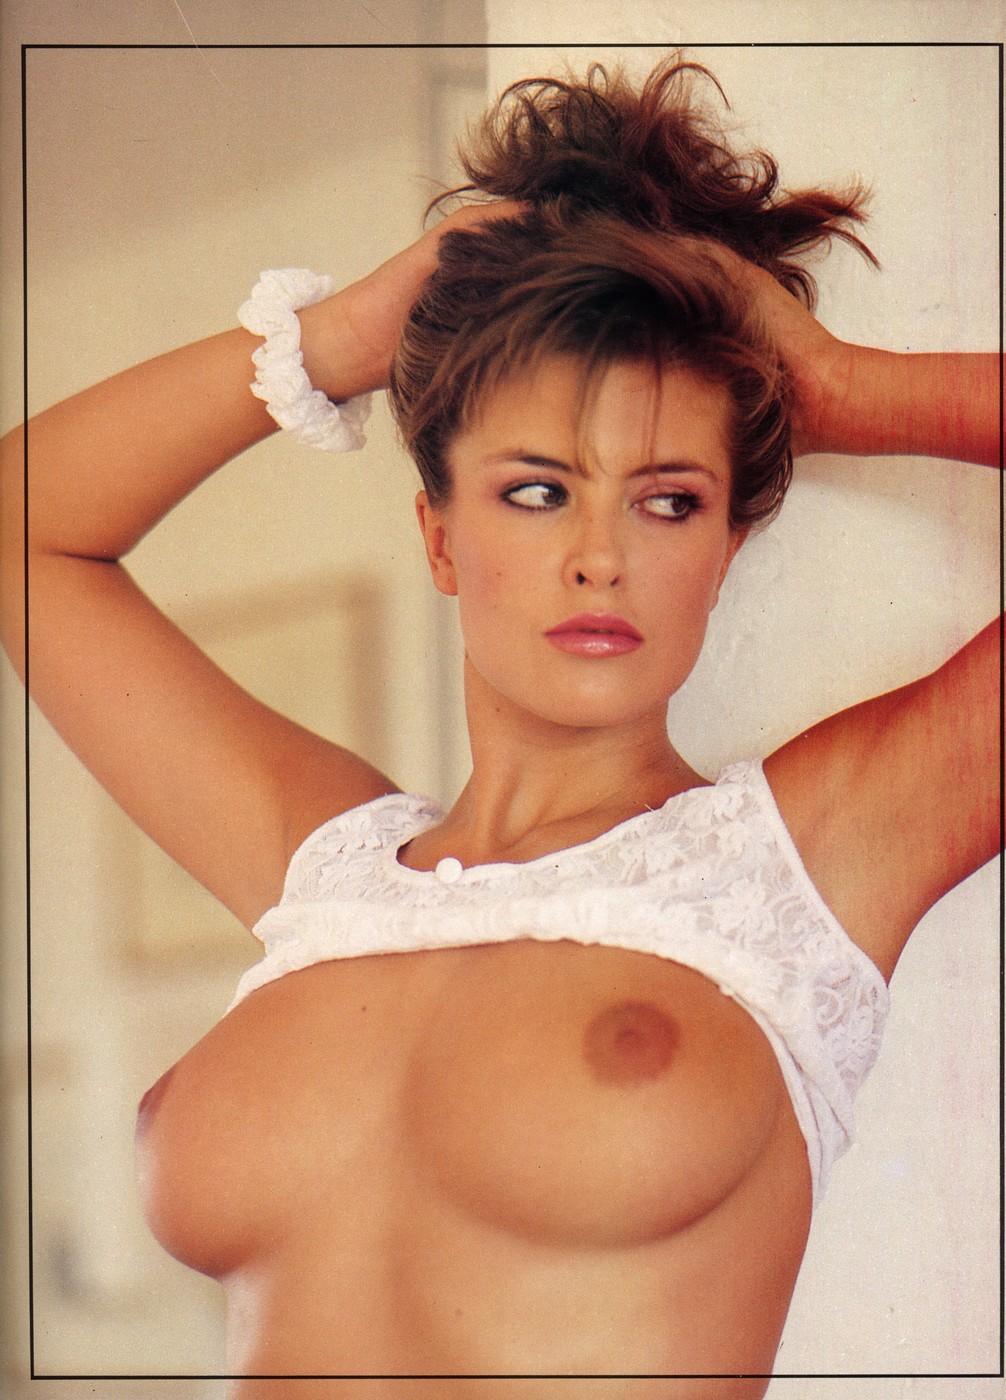 Playboy Playmates Leola Bell Nude